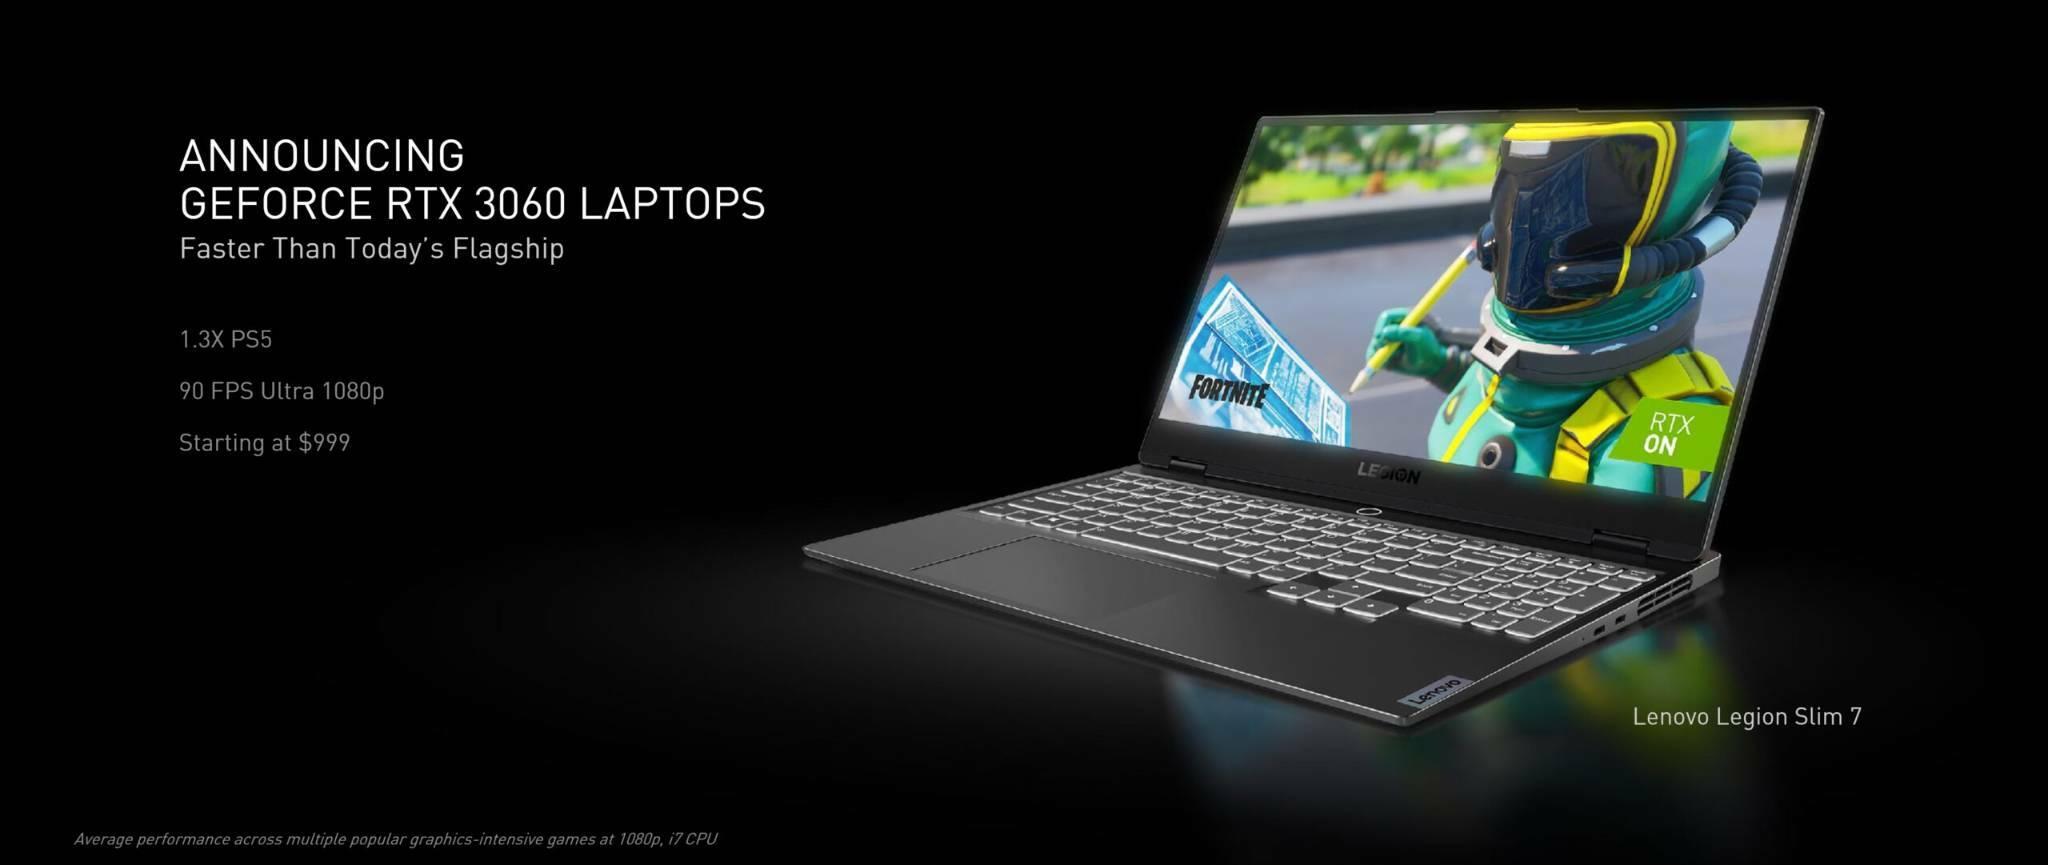 NVIDIA GeForce RTX 3060 Mobile